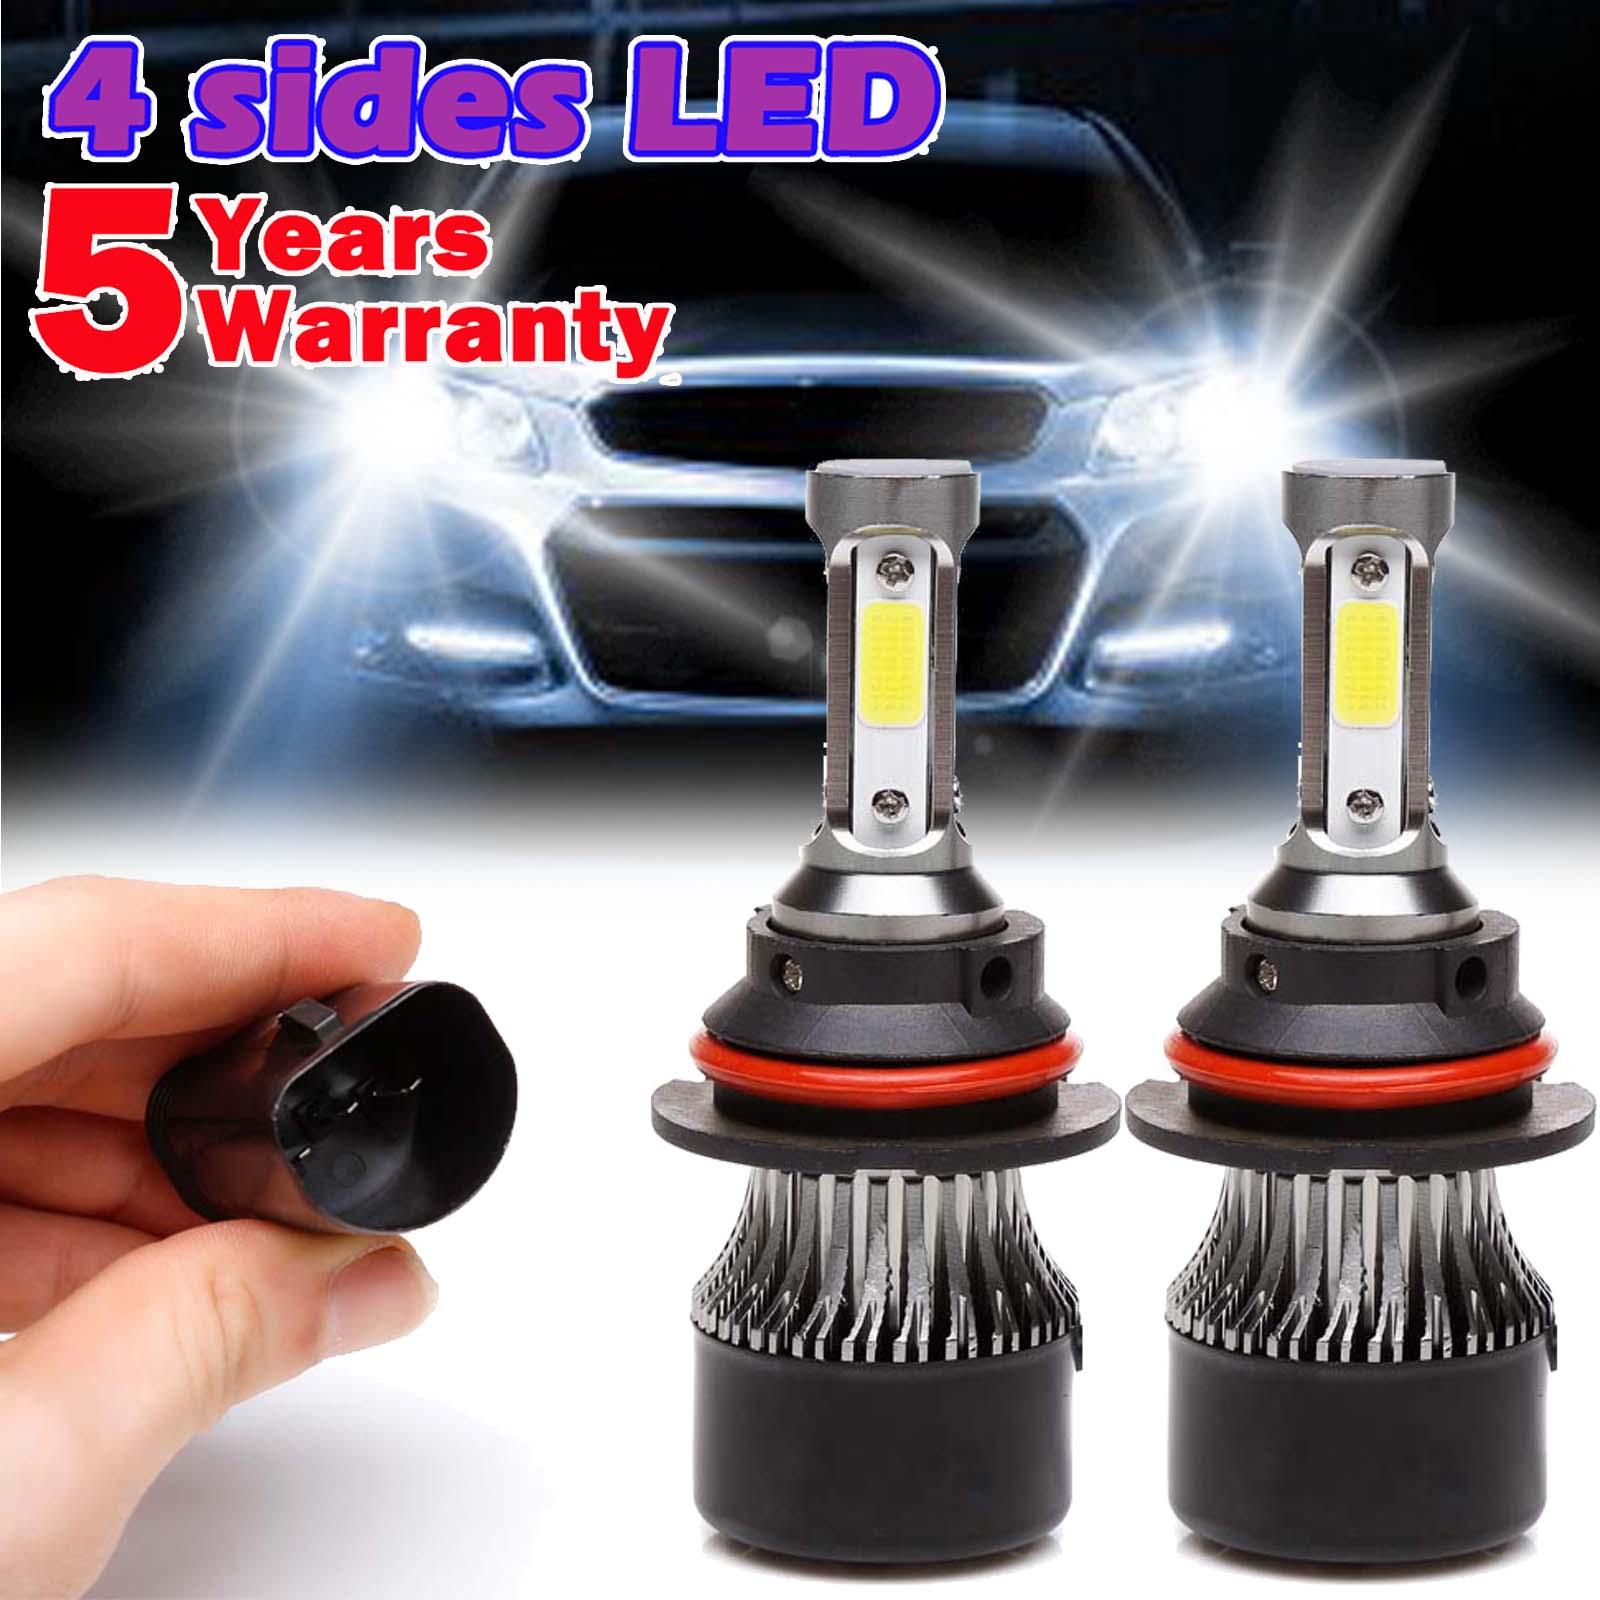 IRONWALLS H7 LED Headlight Kit 6-Side 360° HI//LO Beam Bulbs 300000LM 6000K White